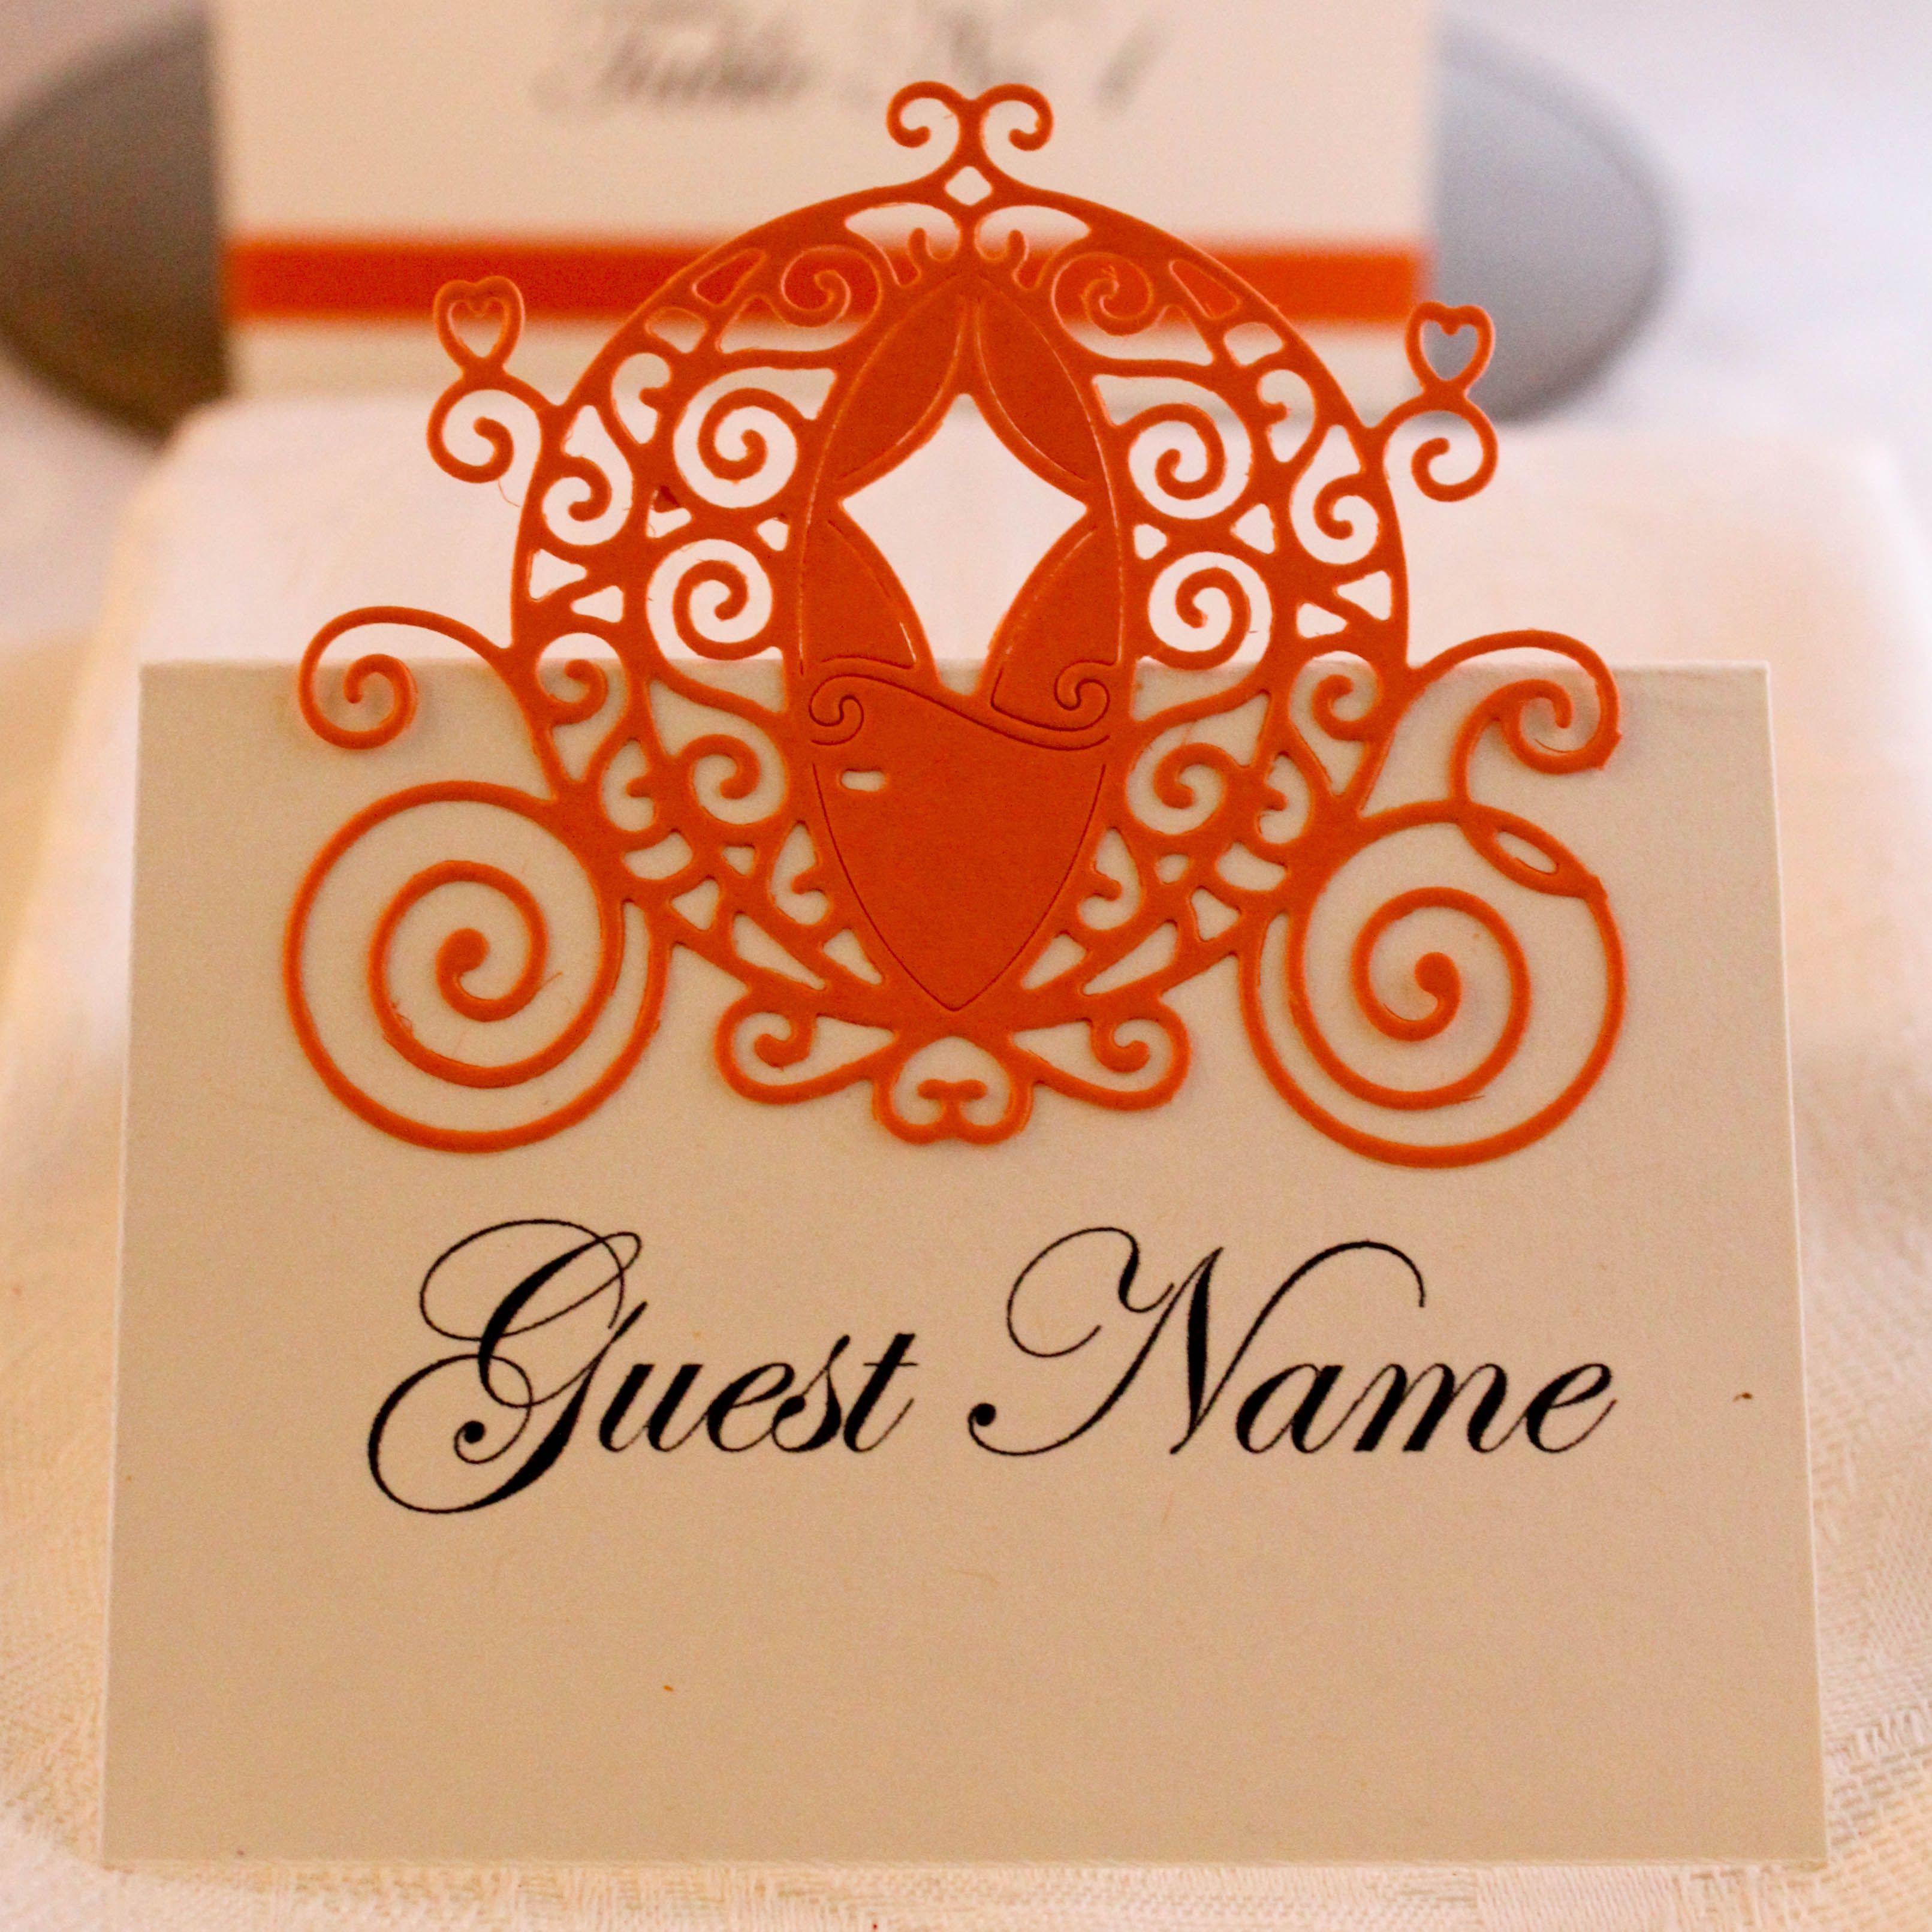 Pin on Bridal & Wedding Idea's